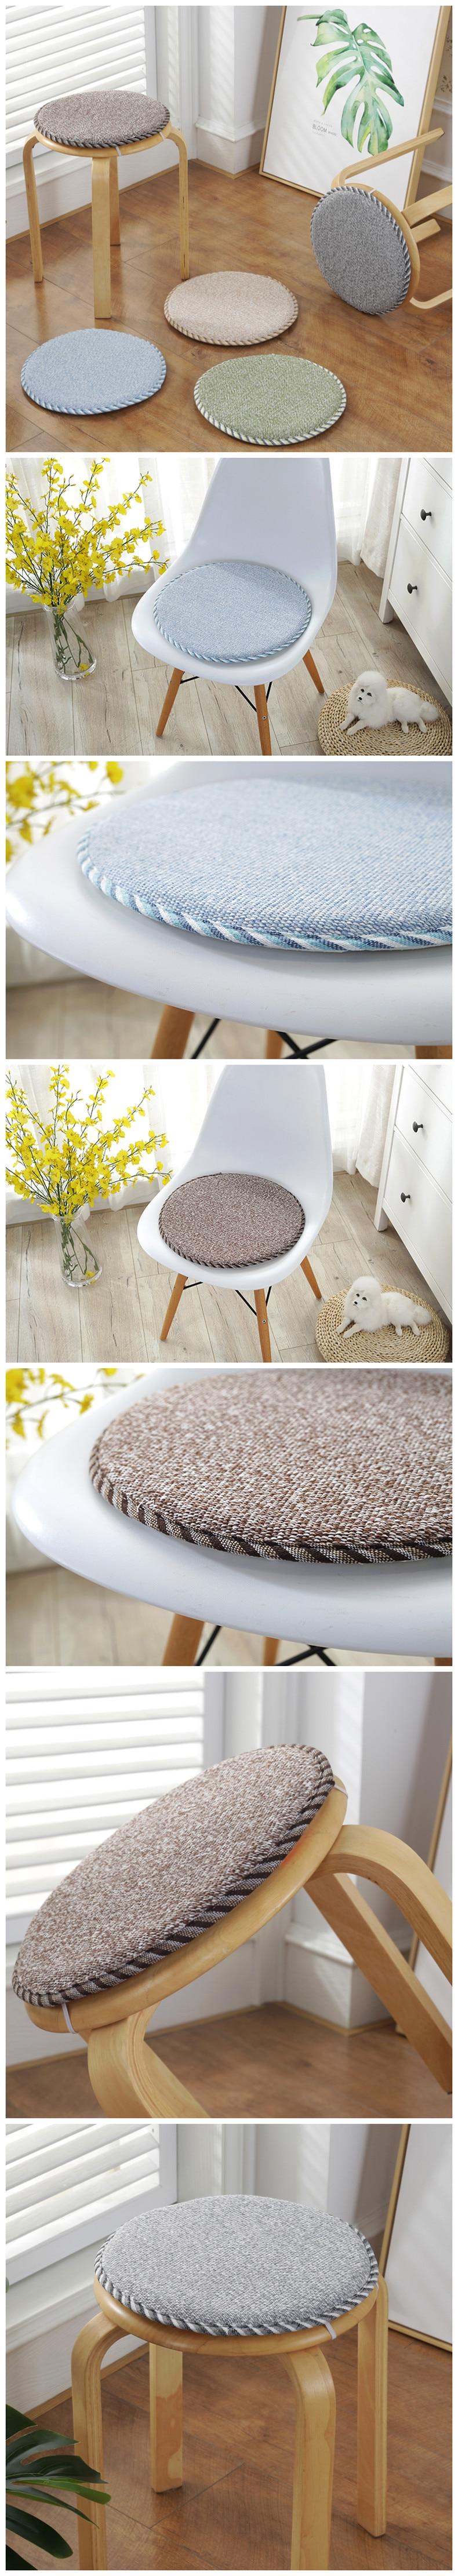 Winter Round Chair Cushion Foam Super Soft Seat Cushion Home Office Decor Throw Pillow Dinning Stool Cushion Anti-slip Sit Pad